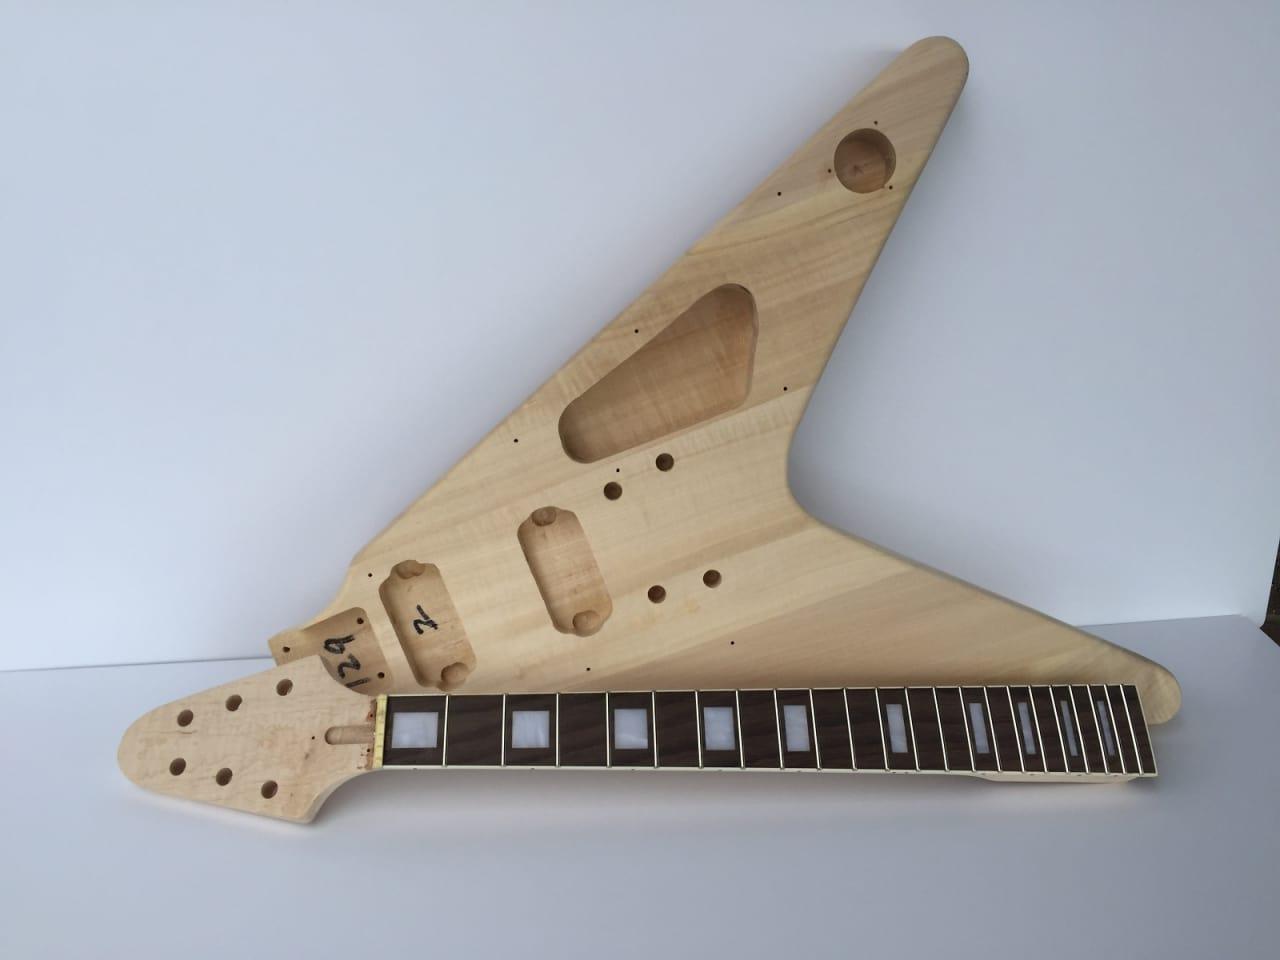 Build Your Own Flying V Guitar Kit